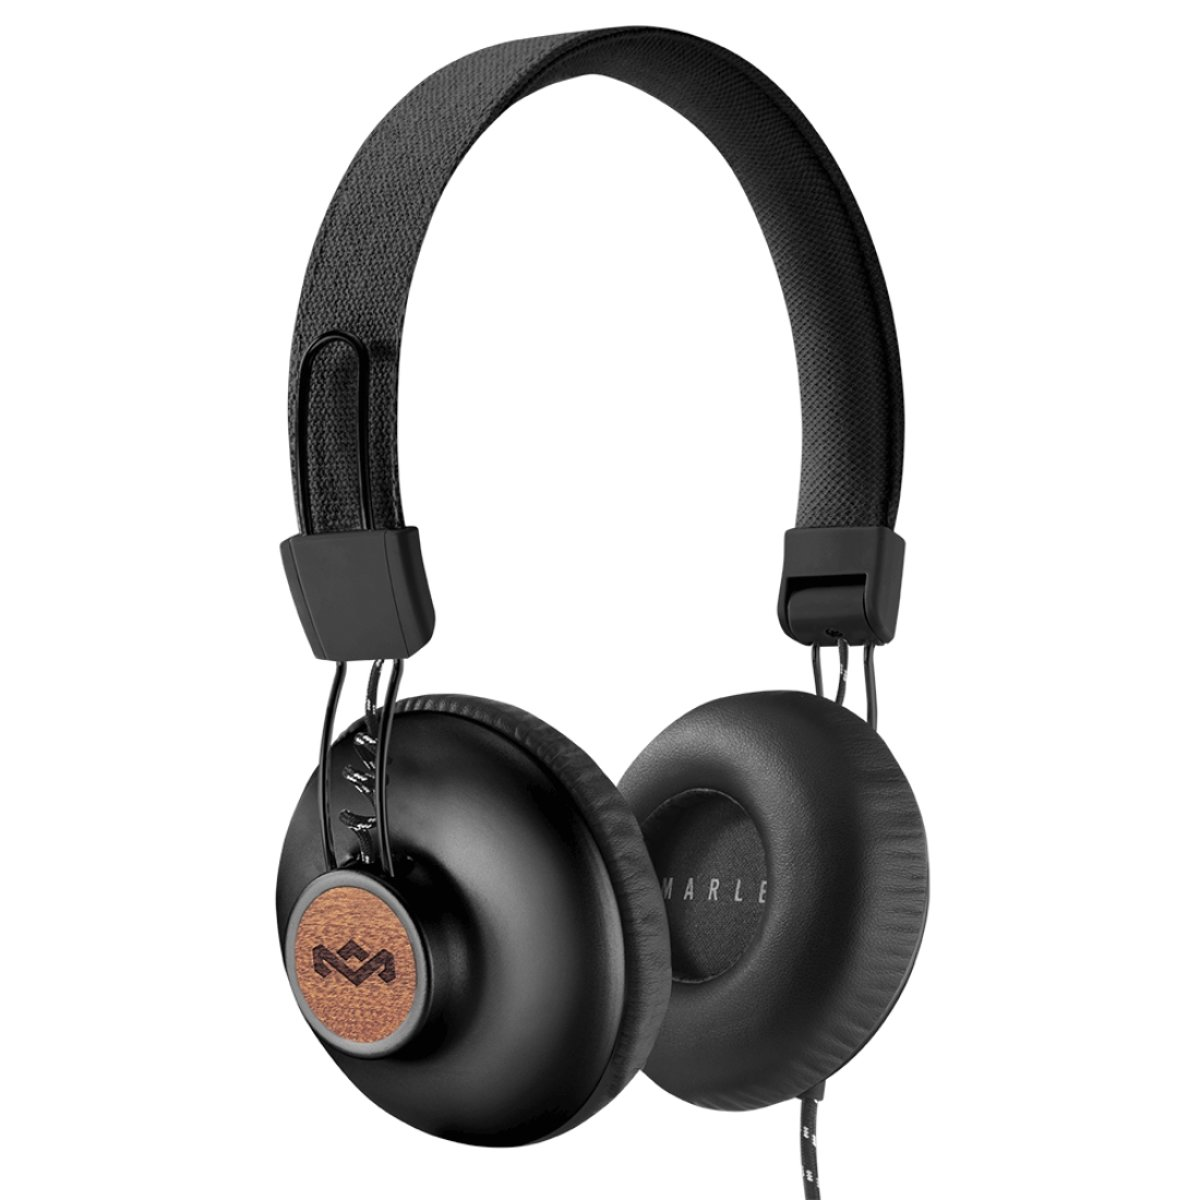 House of Marley Positive Vibration 2.0 - Bedrade on-ear koptelefoon - Signature black